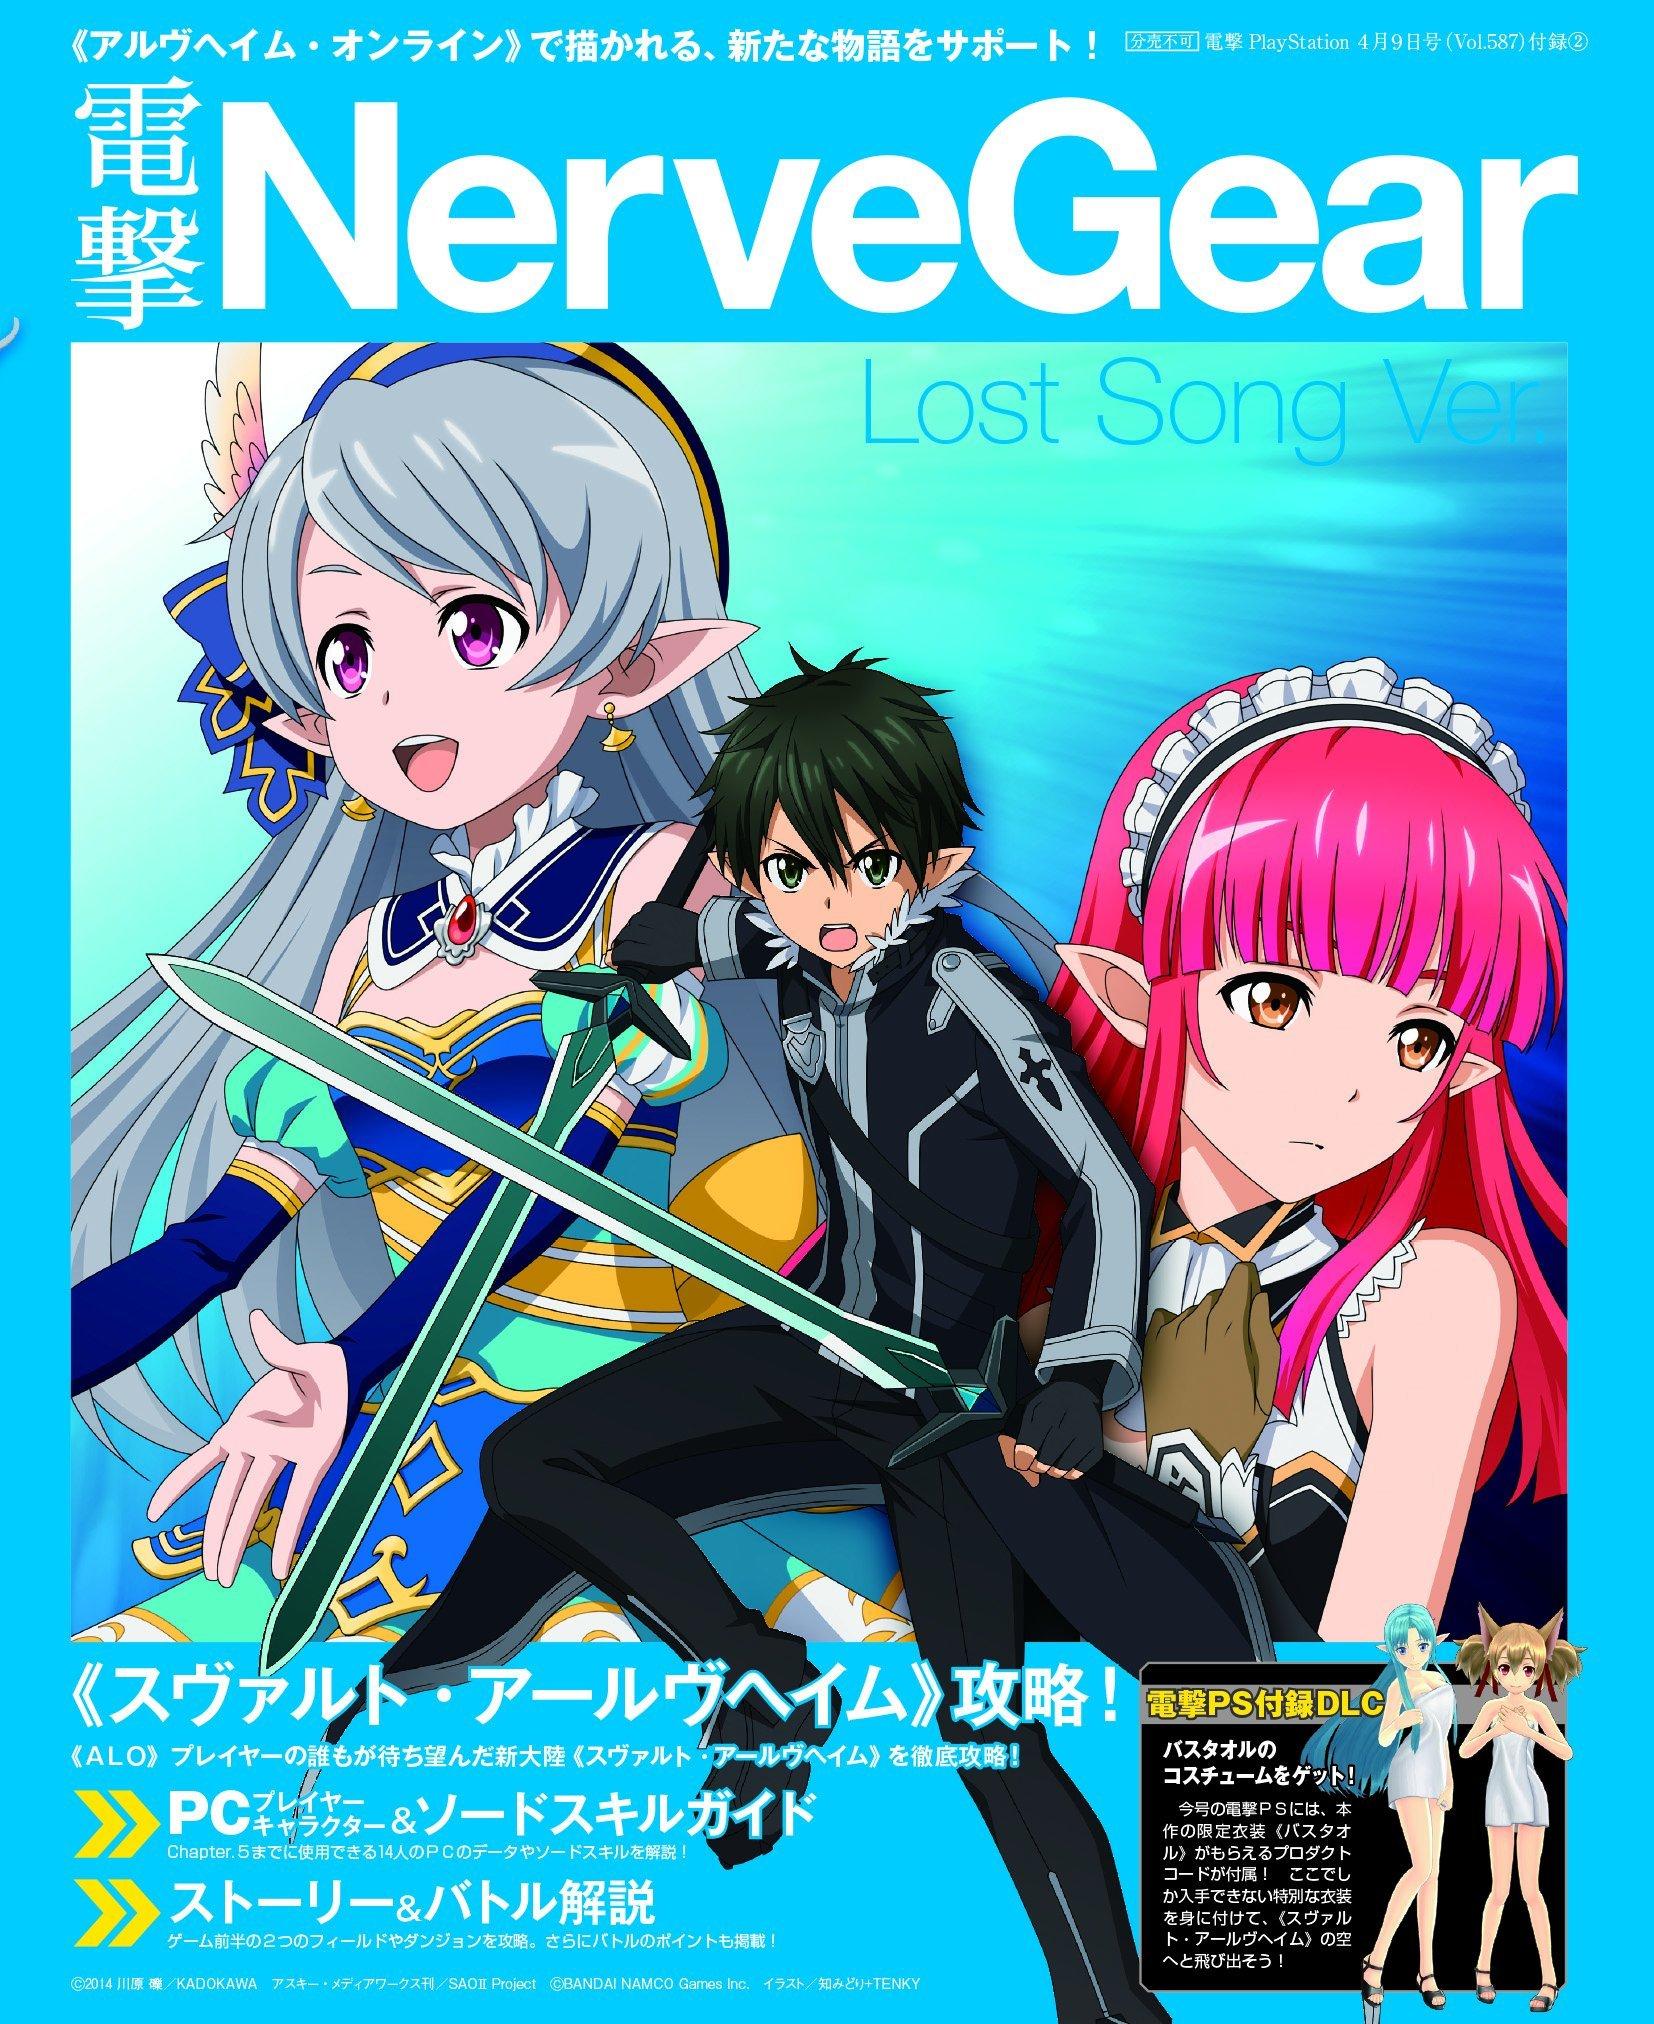 Dengeki NerveGear Lost Song Ver. (Vol.587 supplement) (April 9, 2015)